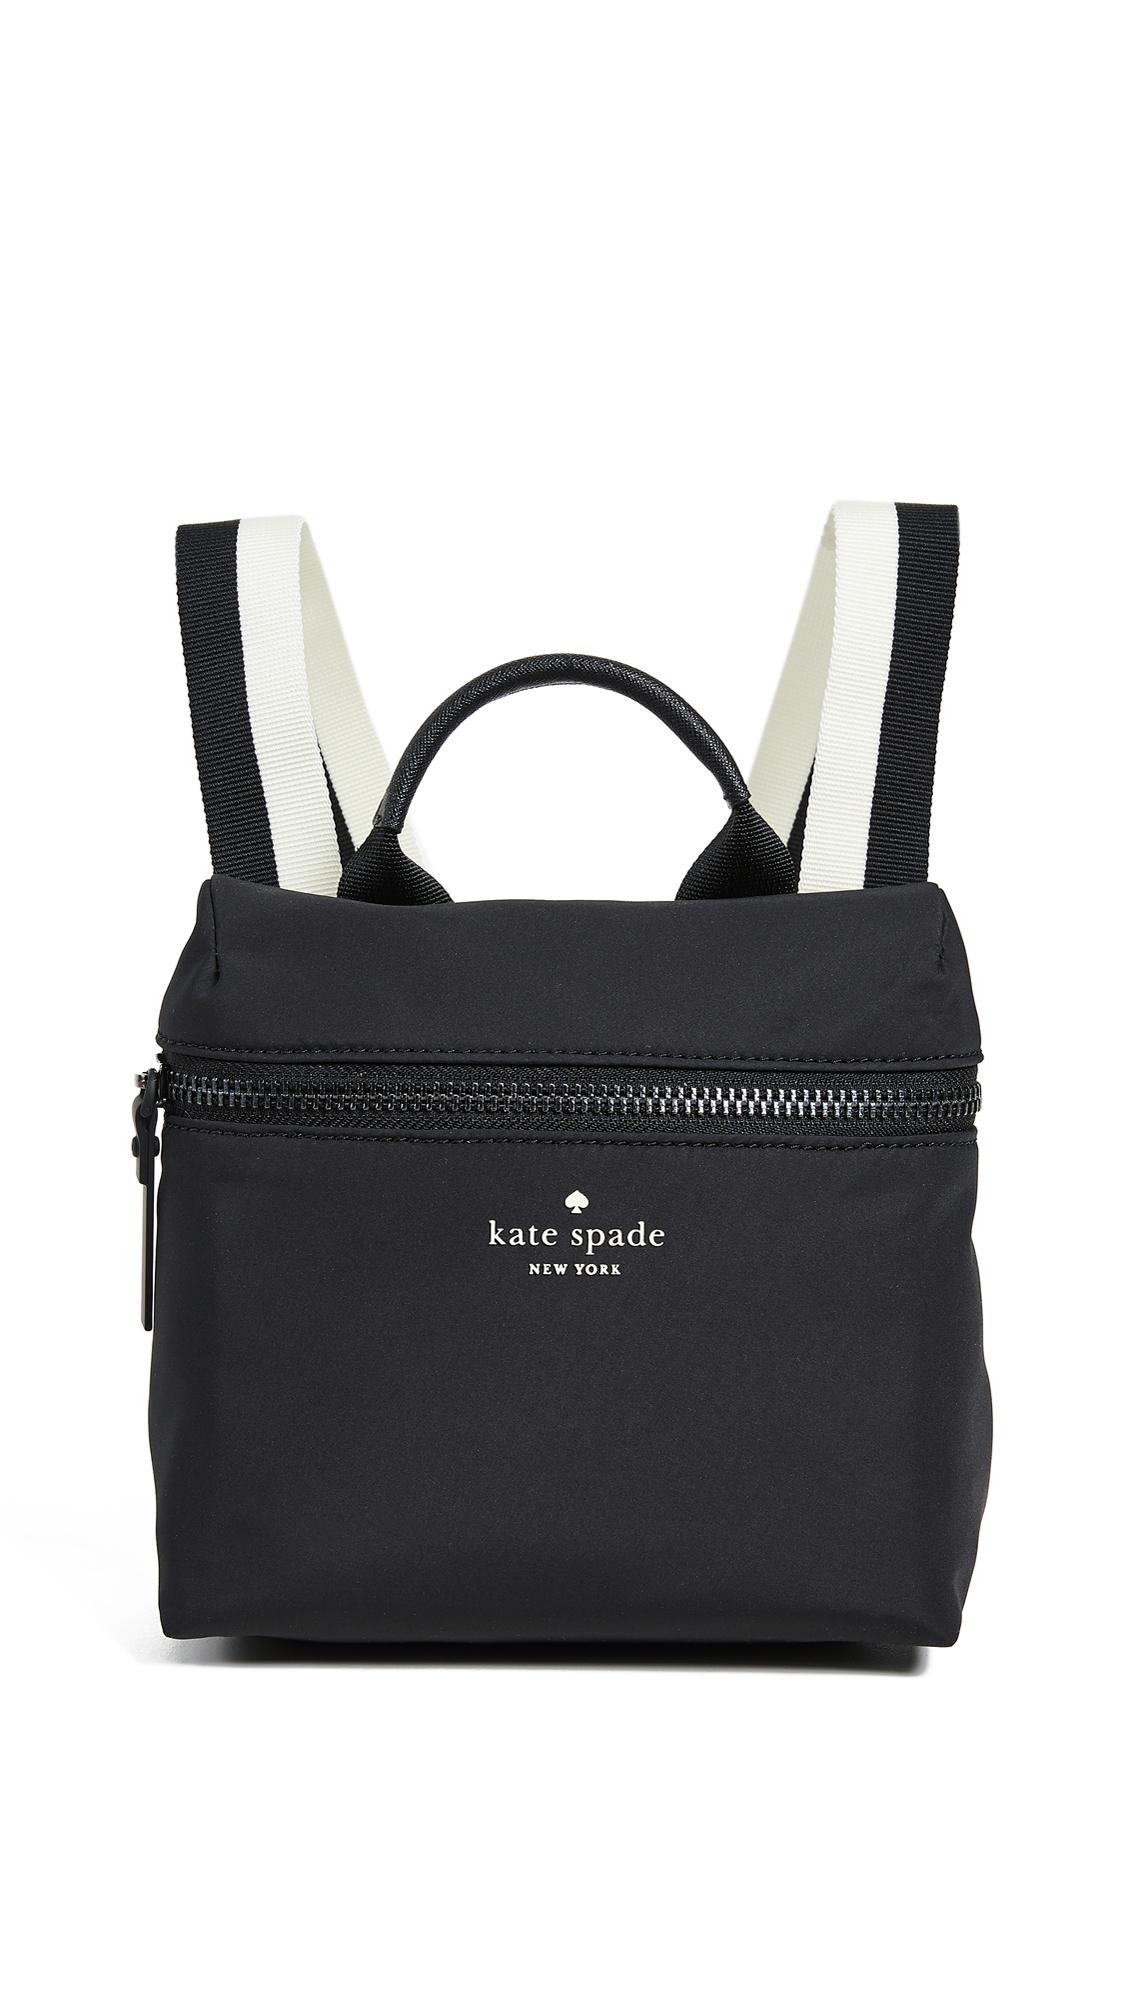 Kate Spade New York Mini Cross Body Bag